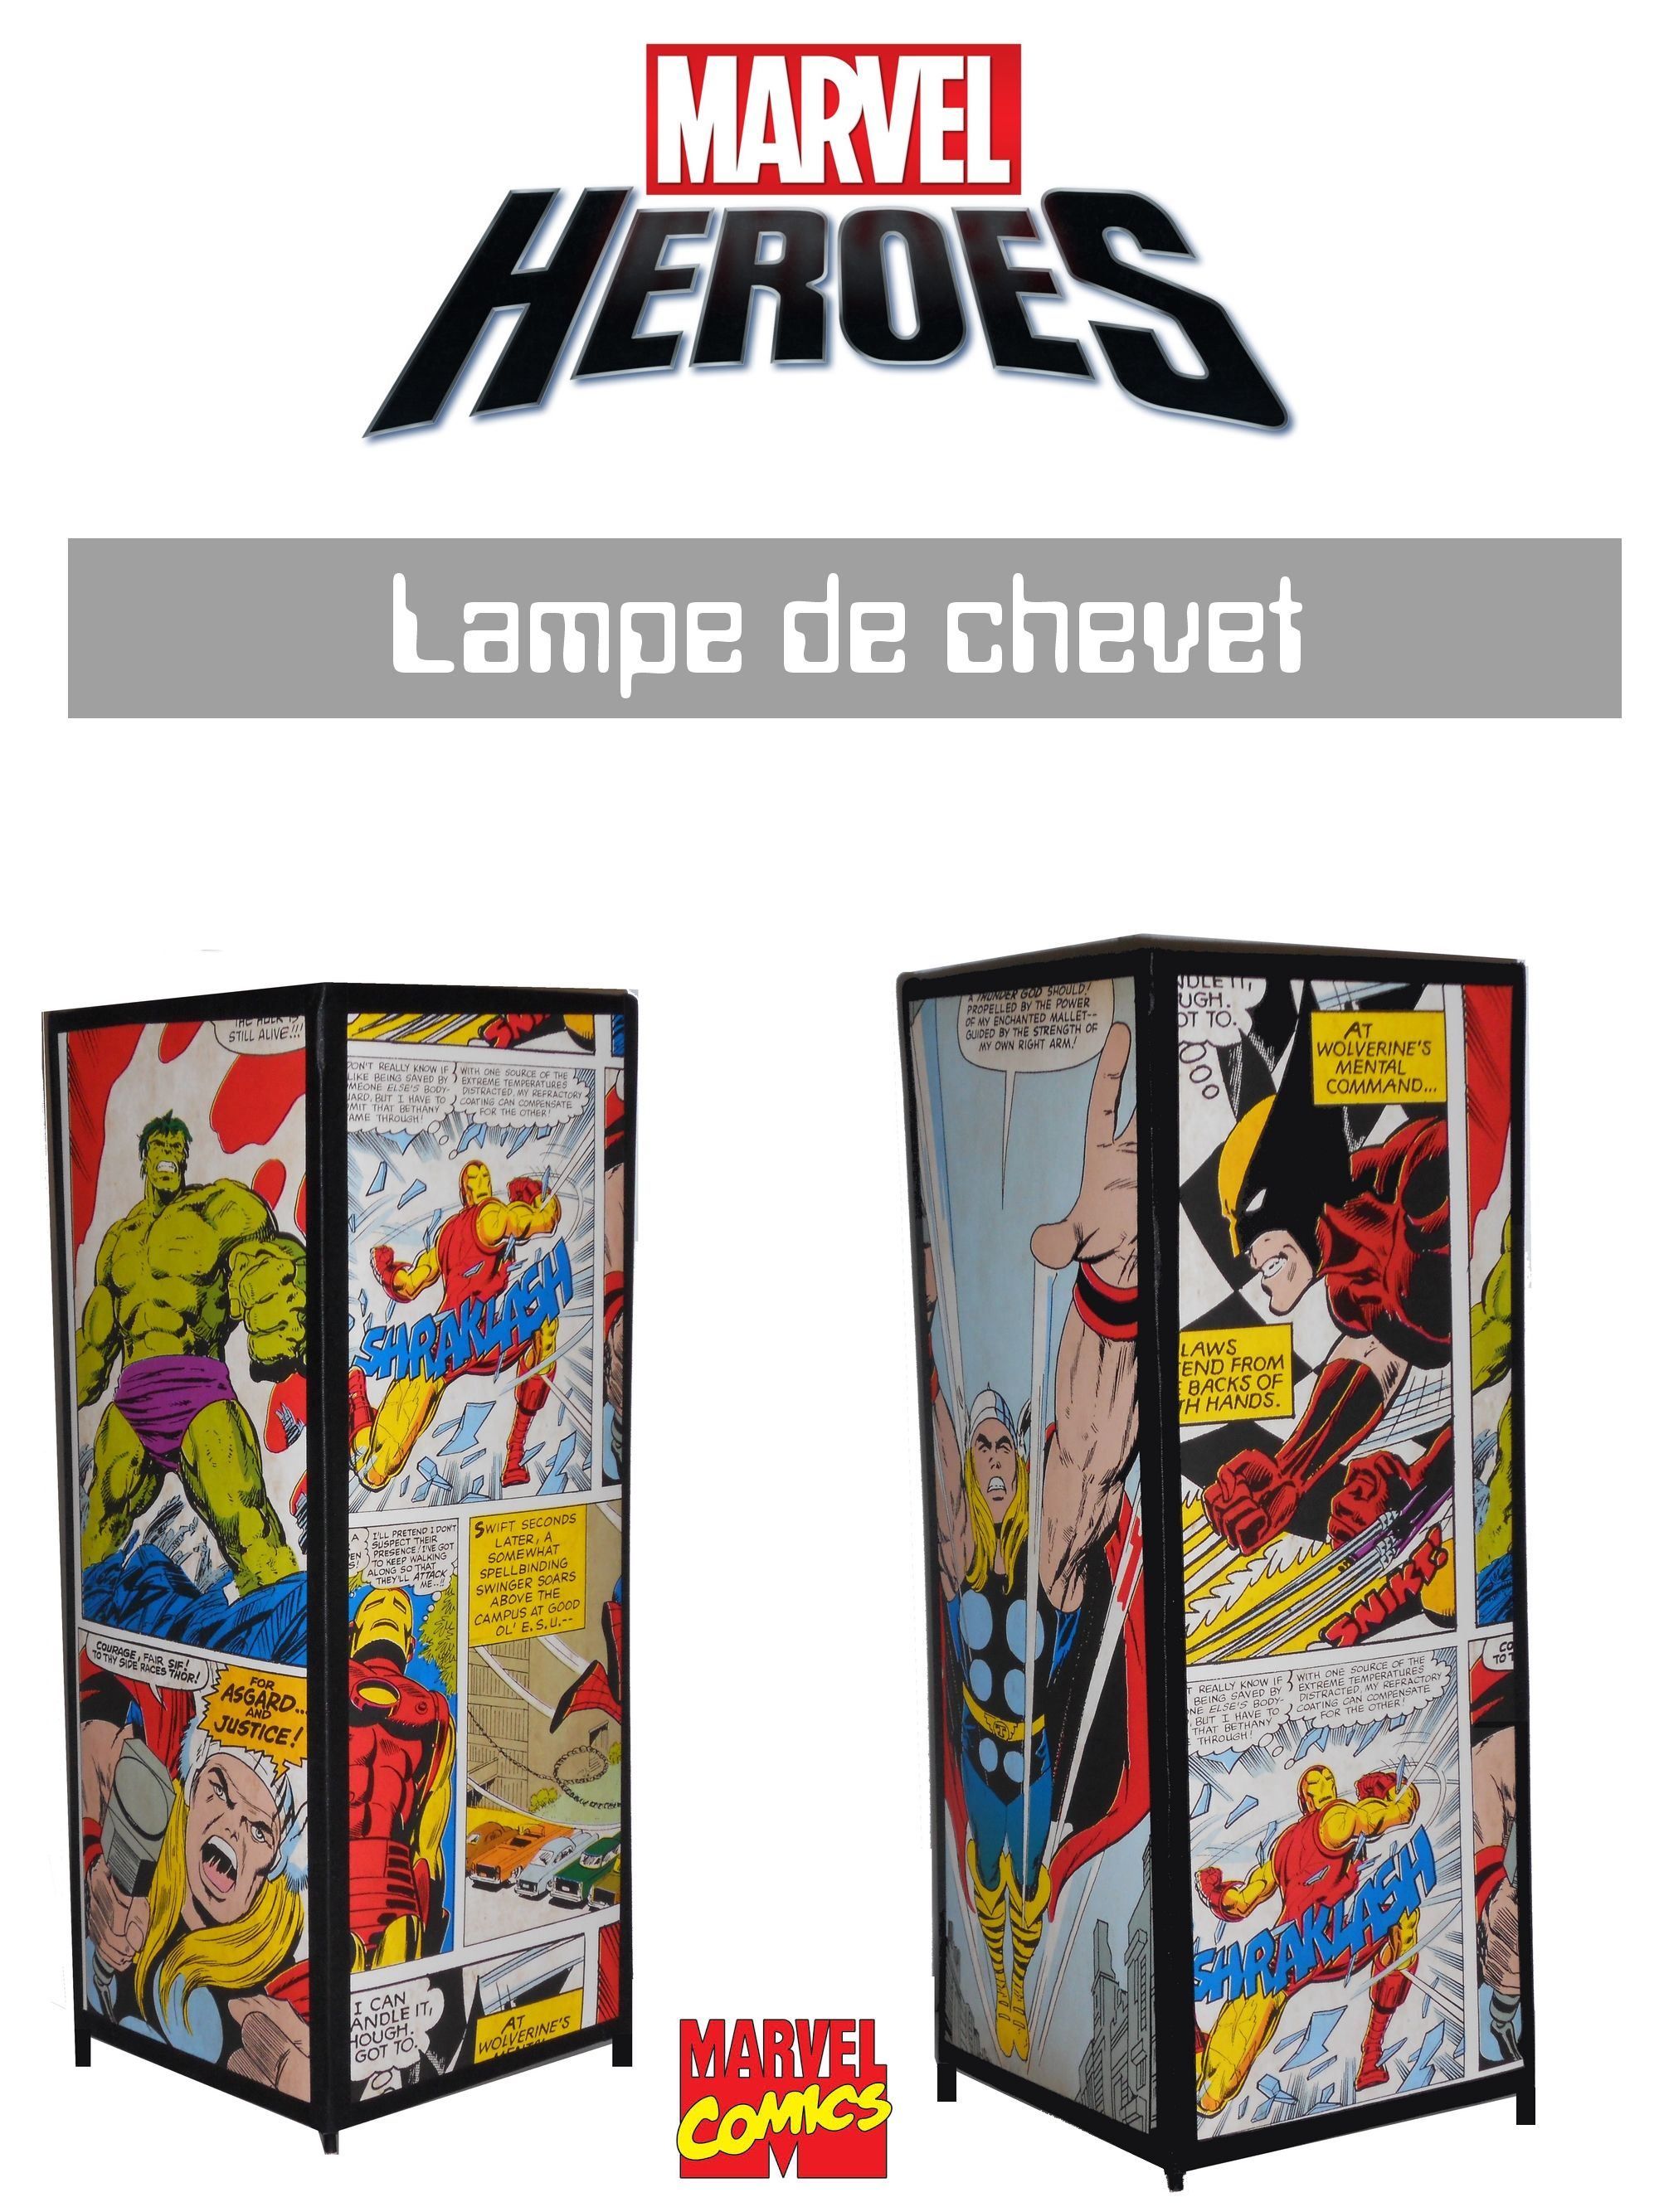 Lampe De Chevet Deco Marvel Speciales Super Heros Hulk Spider Man